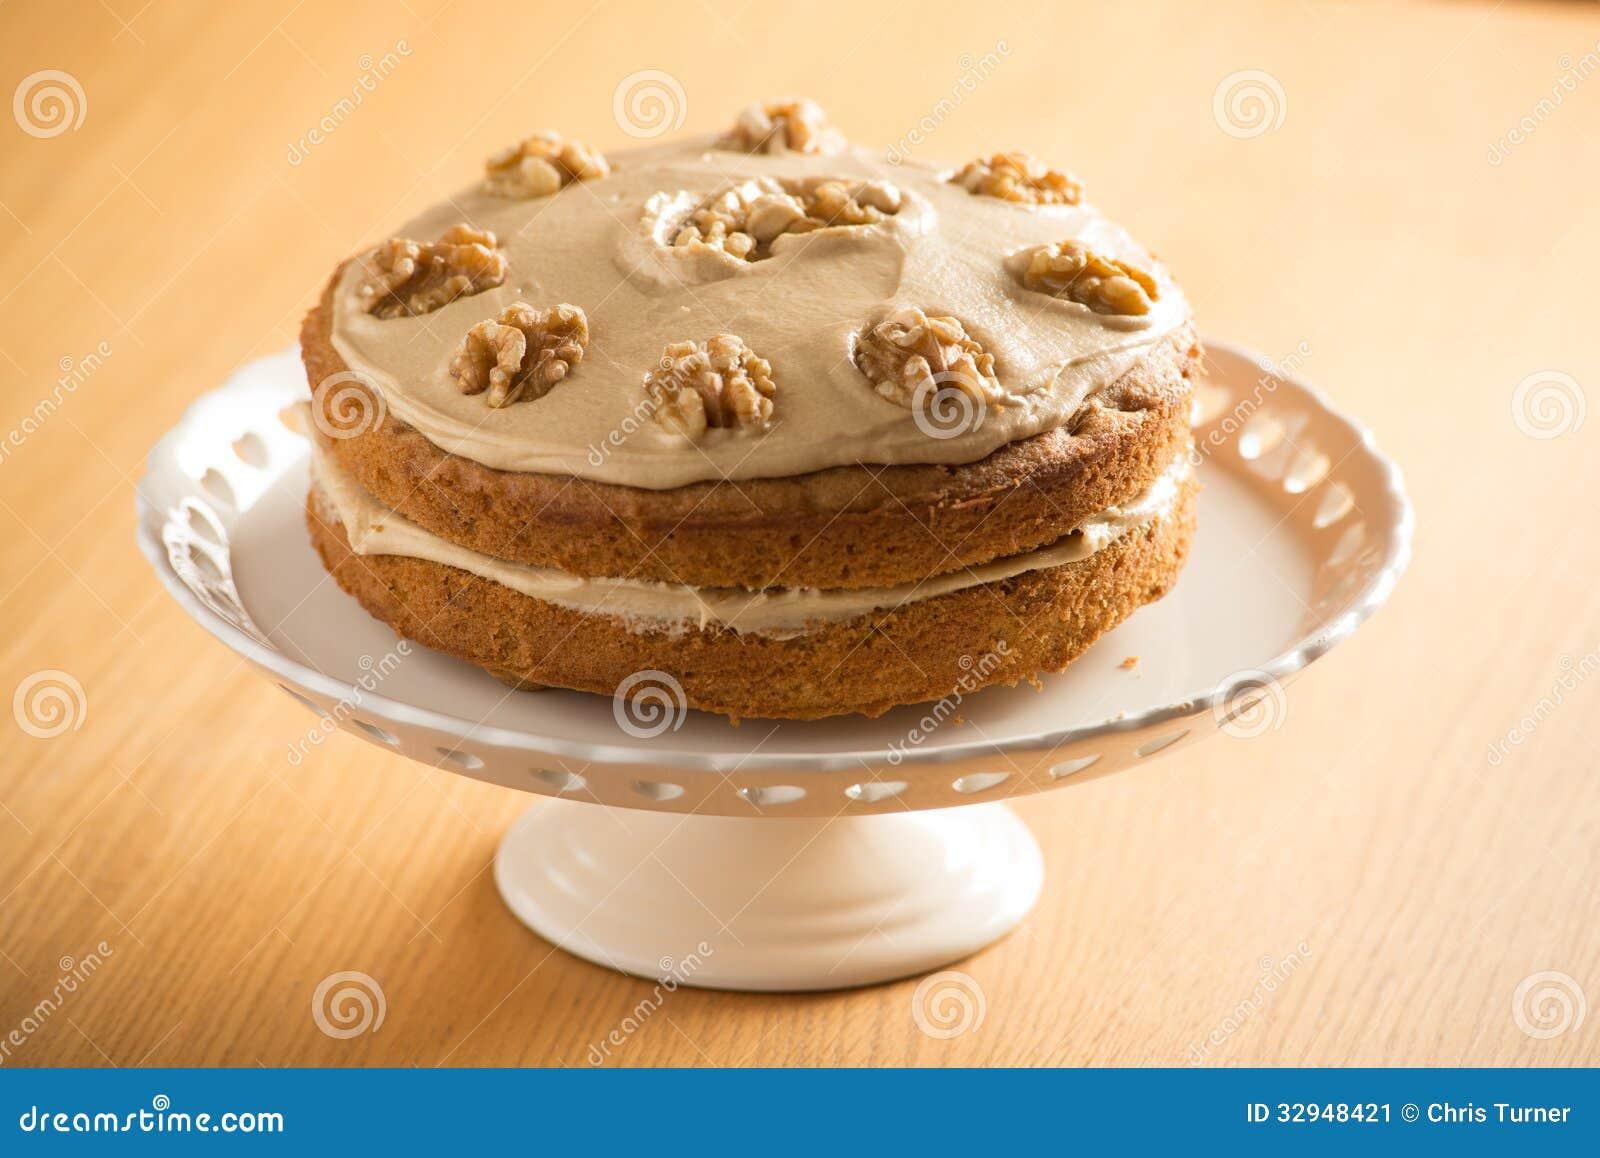 Coffee And Walnut Cake Marscapone